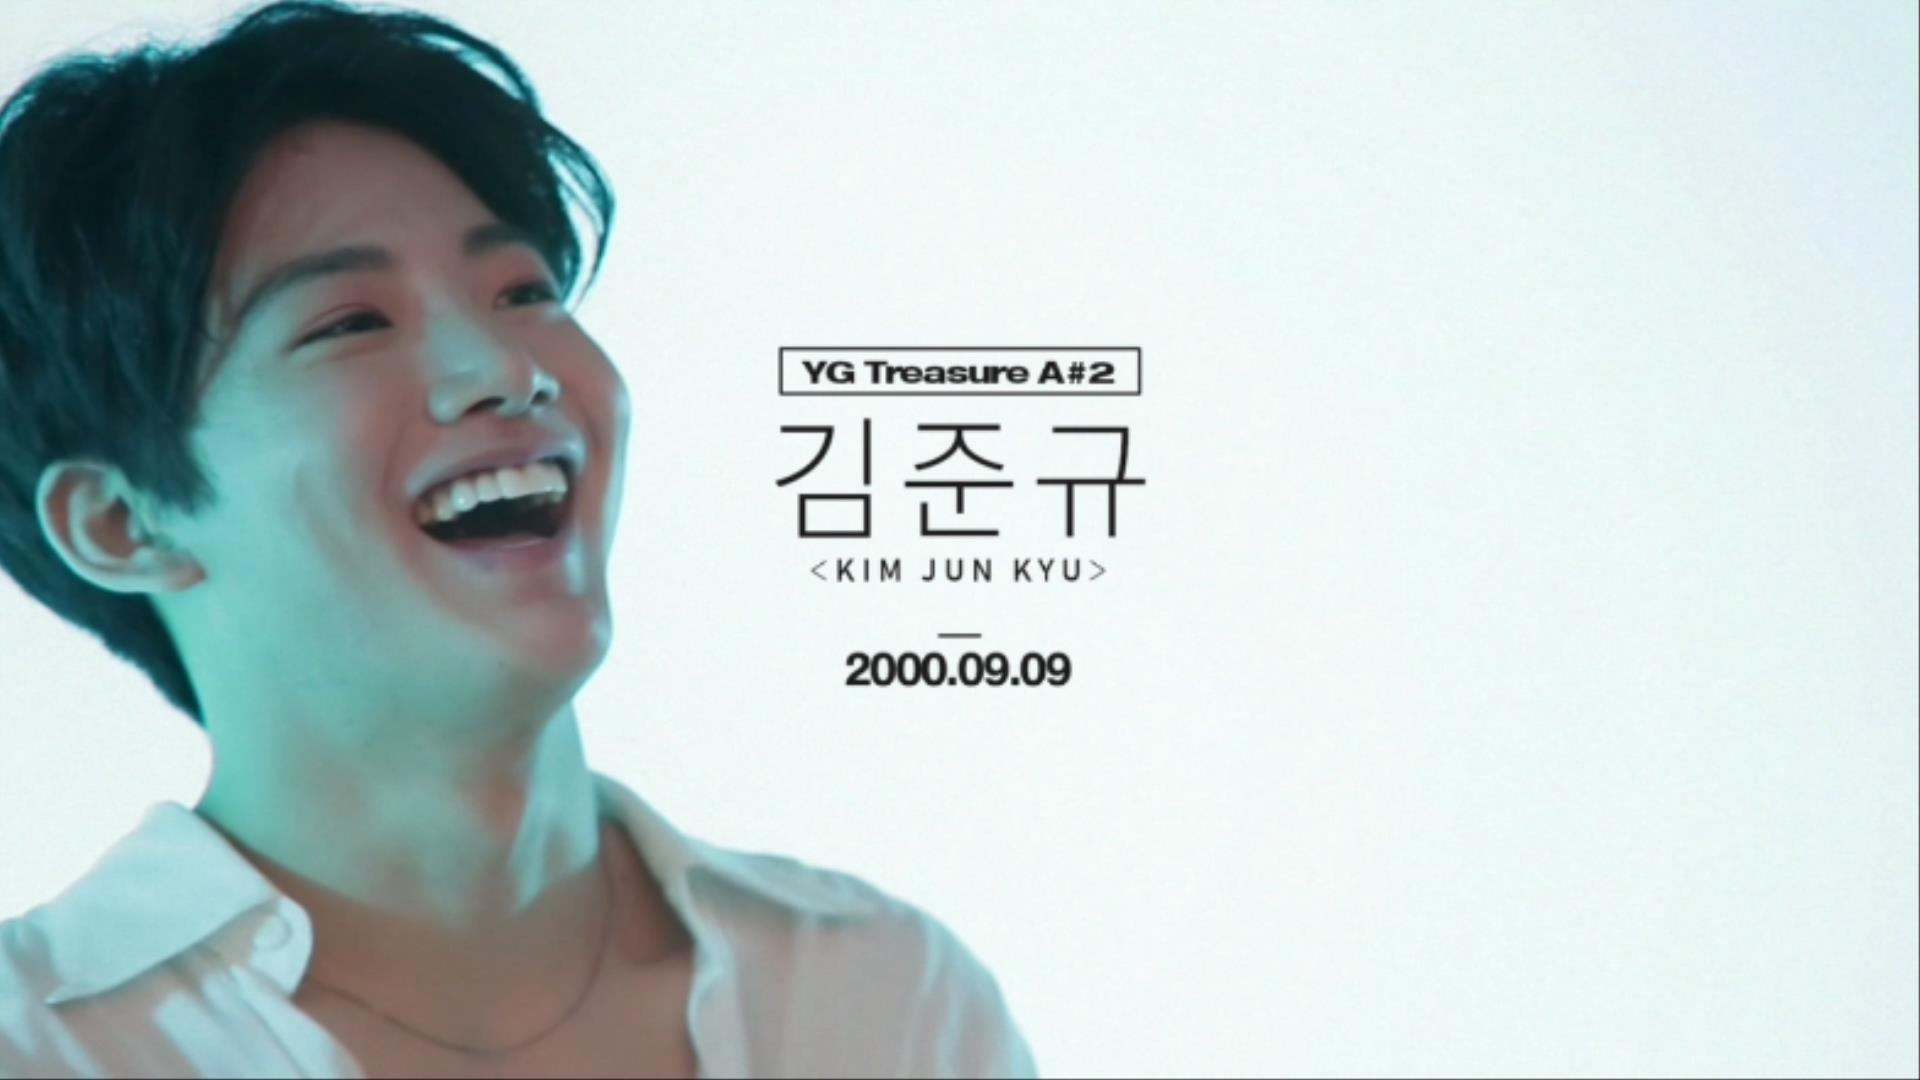 YG보석함ㅣA#2 김준규 <KIM JUNKYU> PROFILE MAKING FILM